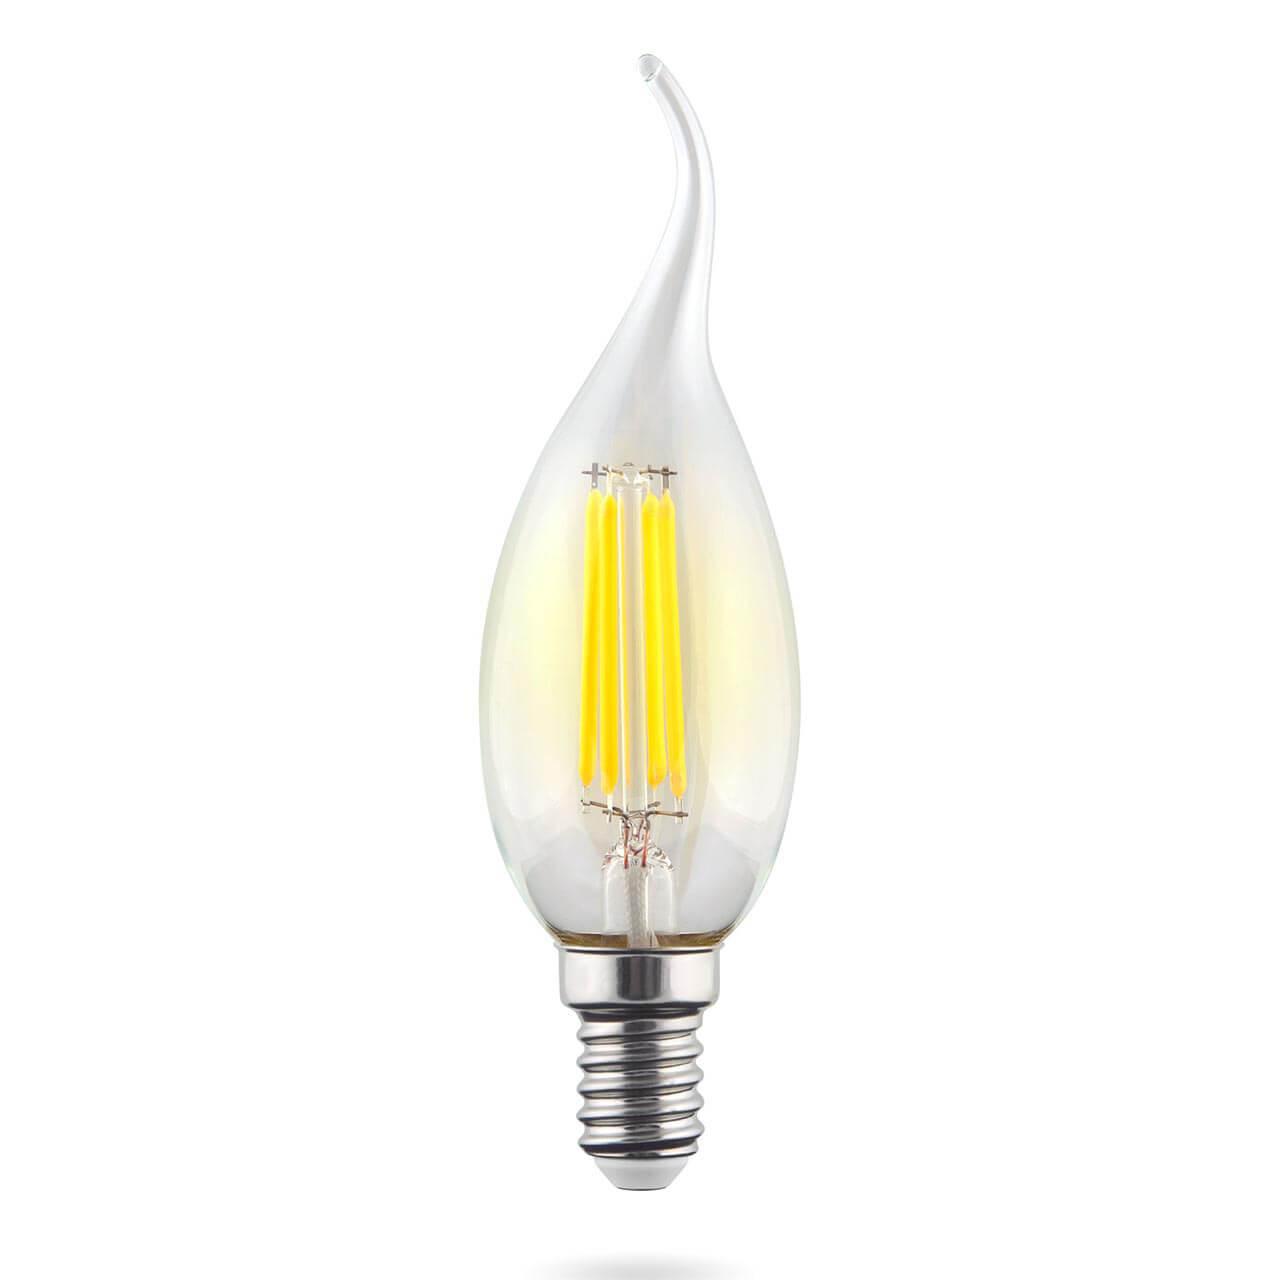 Лампа светодиодная филаментная Voltega E14 9W 4000К прозрачная VG10-CW1E14cold9W-F 7095 voltega лампа светодиодная voltega рефлектор матовый e14 5 4w 4000к vg4 rm2e14cold5w 5756